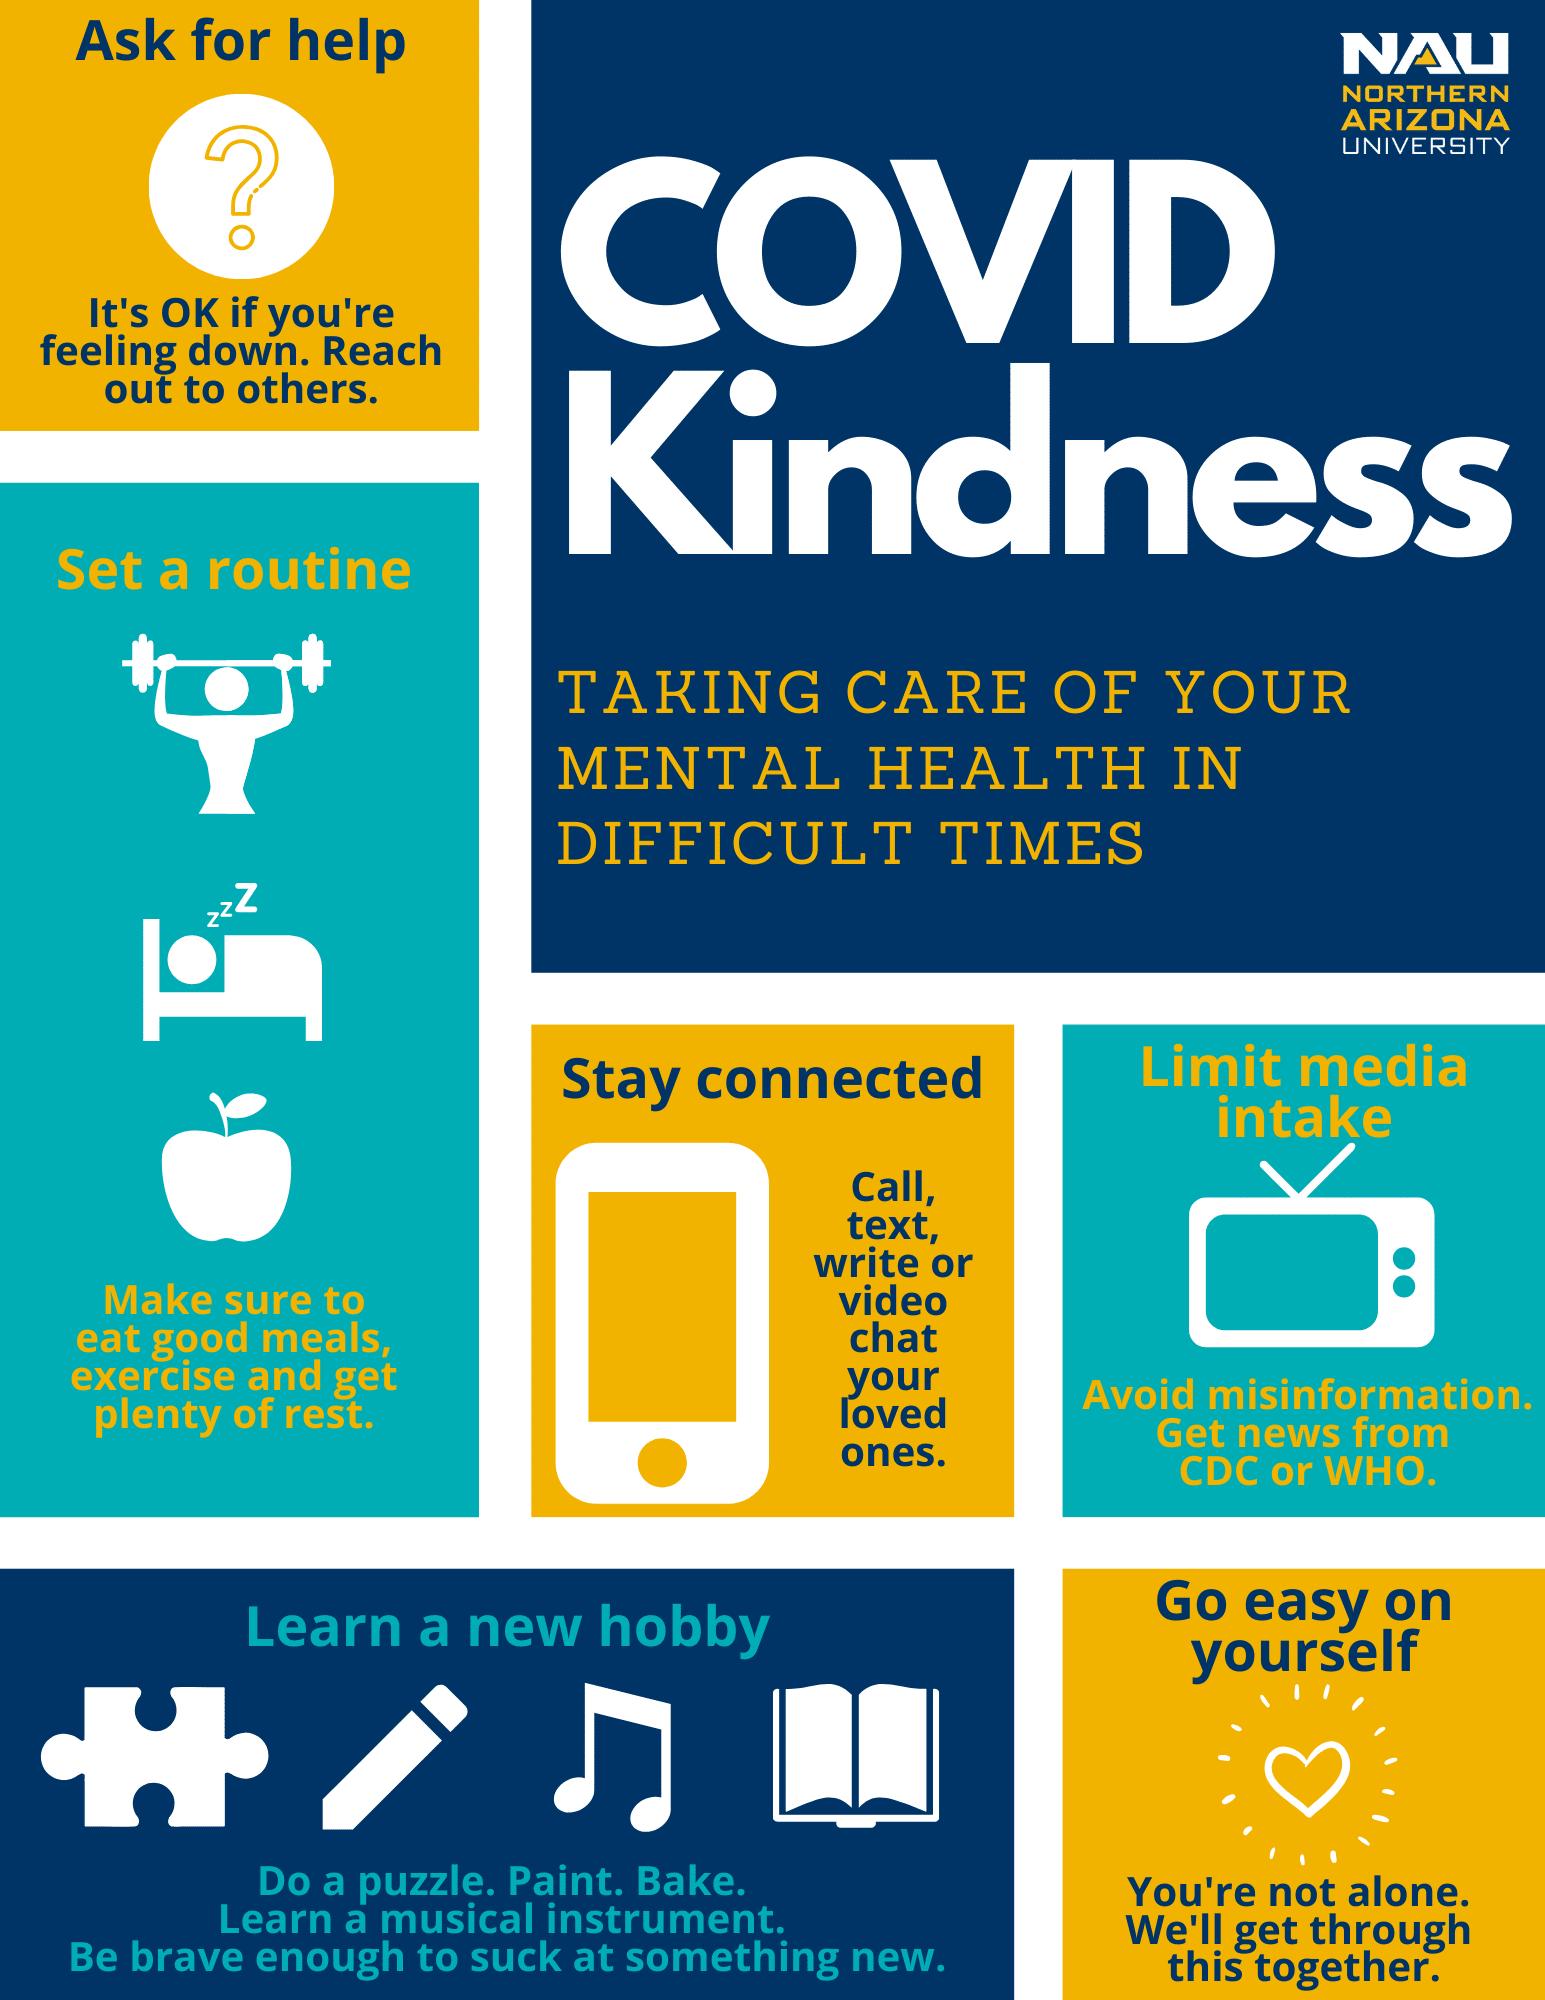 COVID Kindness Mental Health